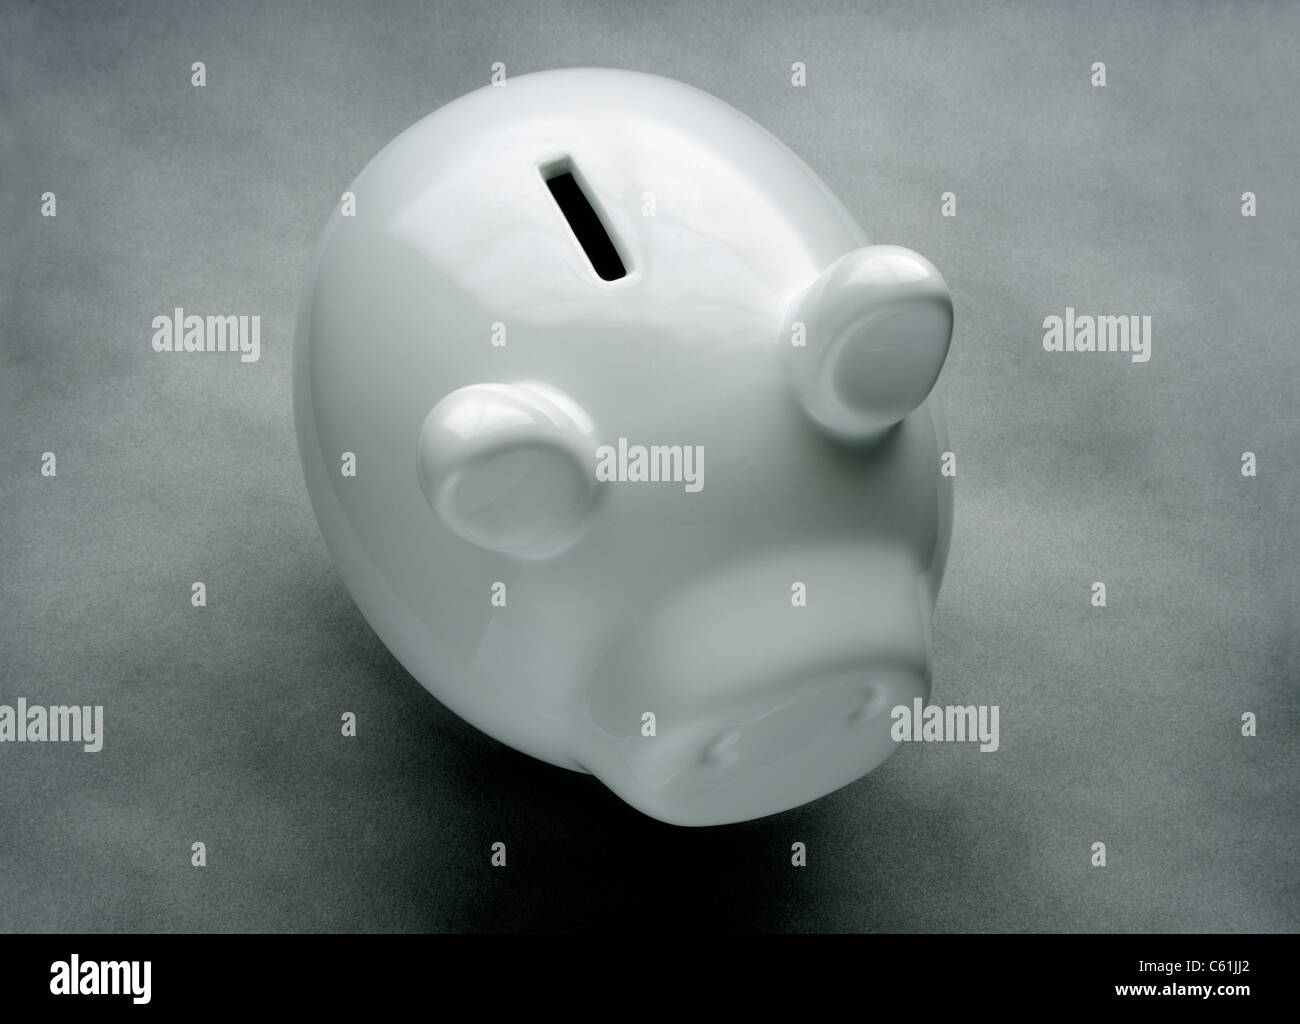 PIGGYBANK WHITE PIG MONEYBOX PIGGY BANK Stock Photo